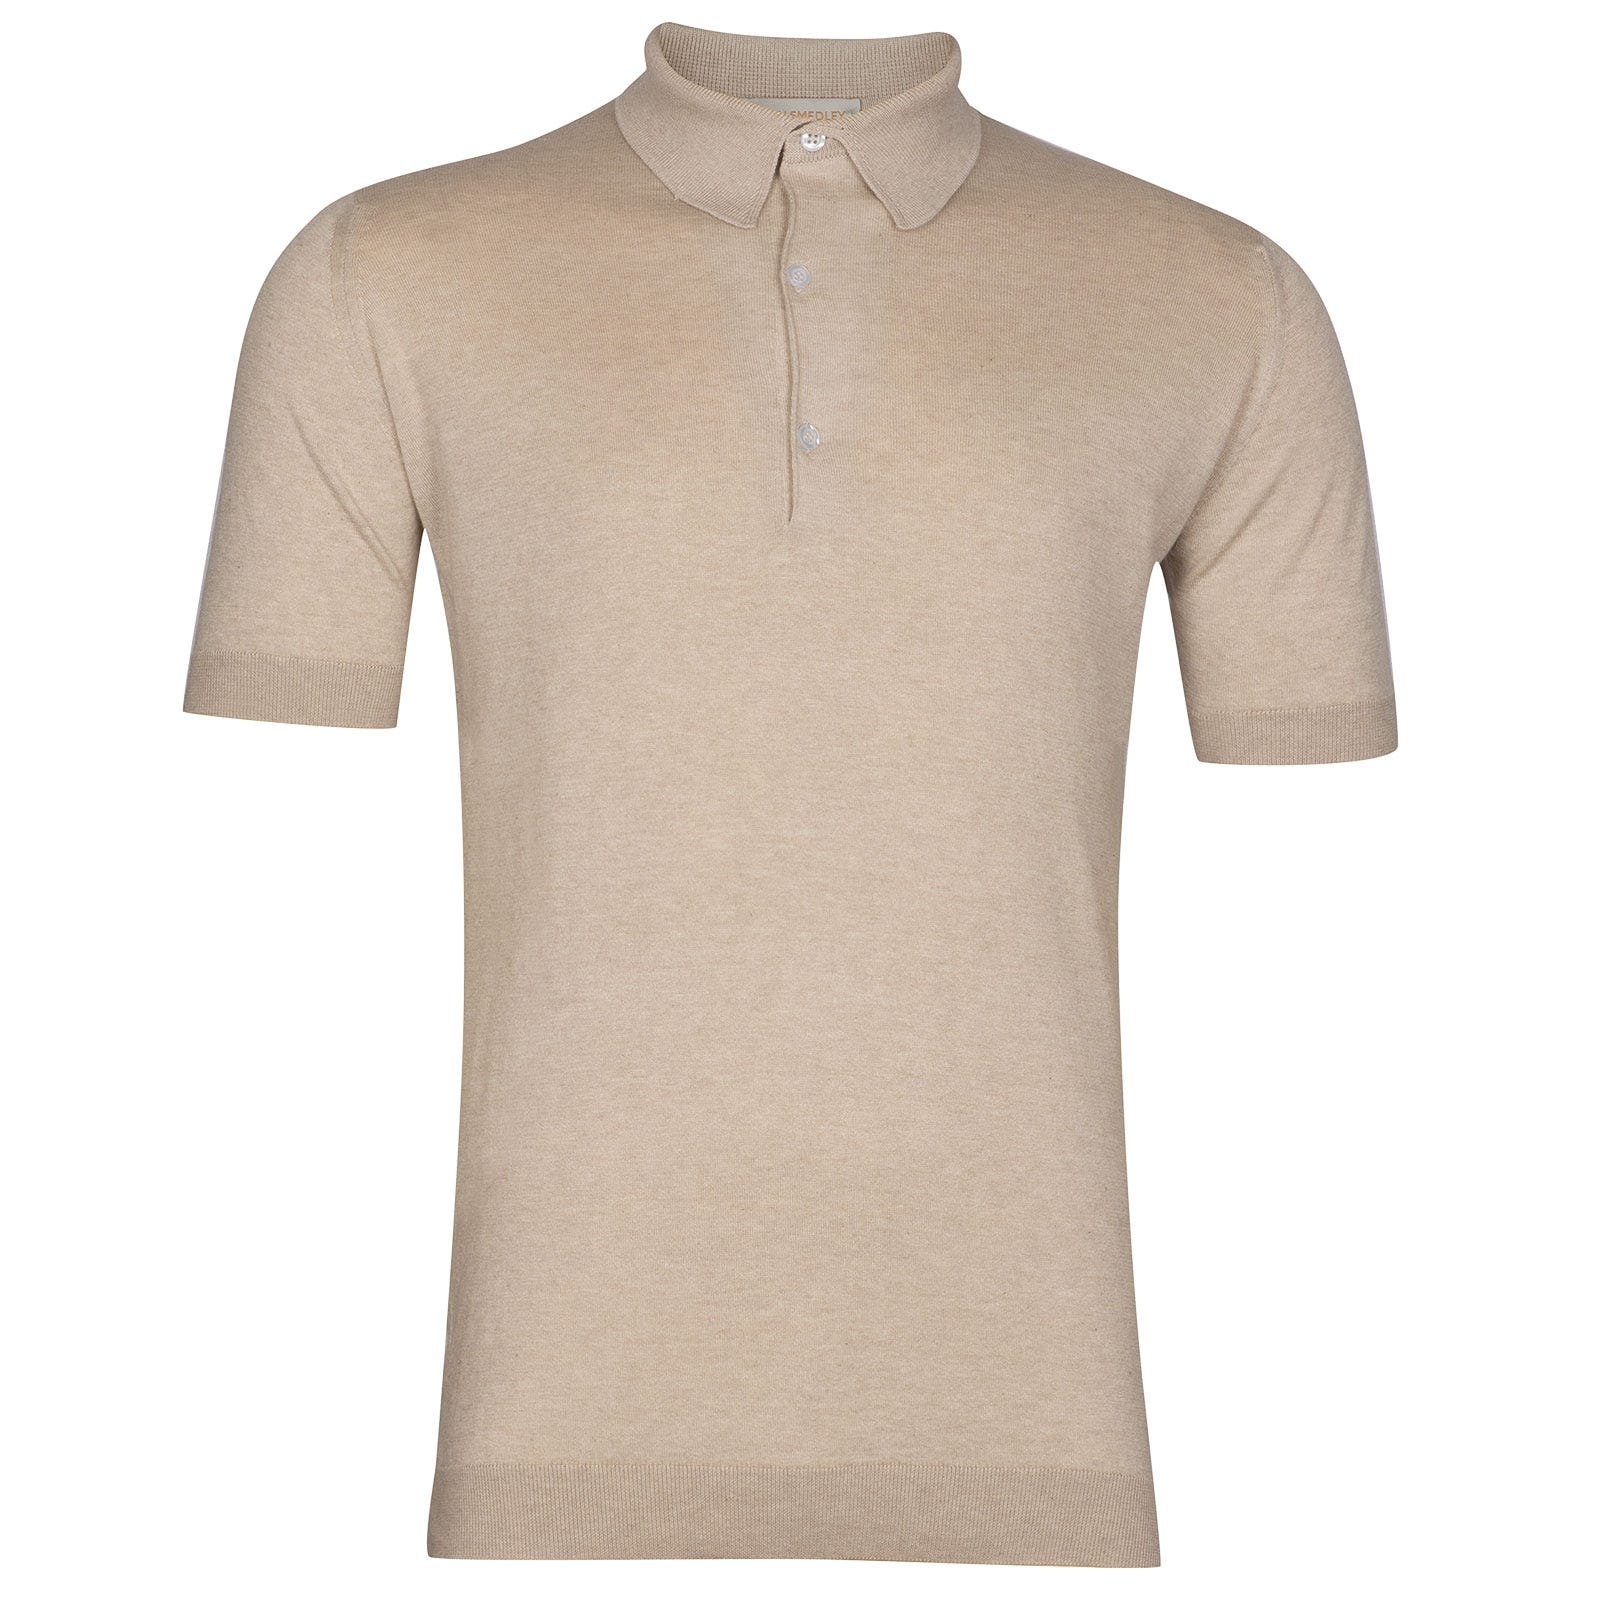 John Smedley Haddon Sea Island Cotton and Cashmere Shirt in